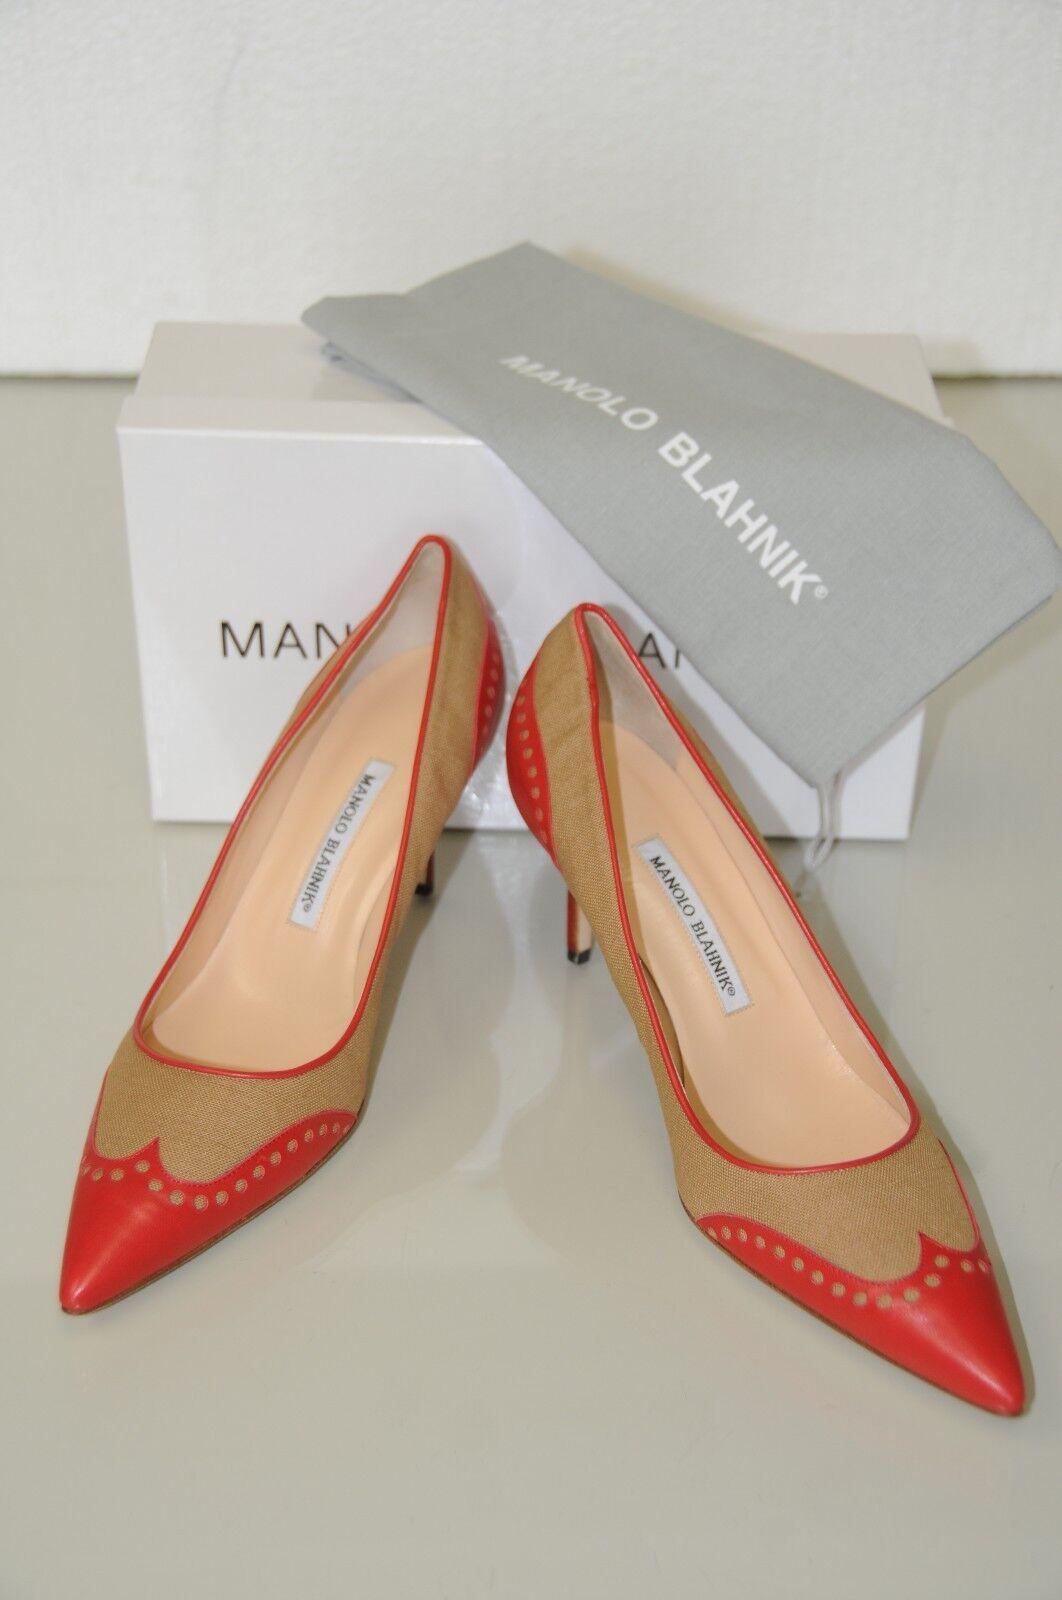 New Manolo Blahnik Coquette rot Tan Beige Linen Dots Dots Dots schuhe Heels Pumps 40.5 10 7160ce